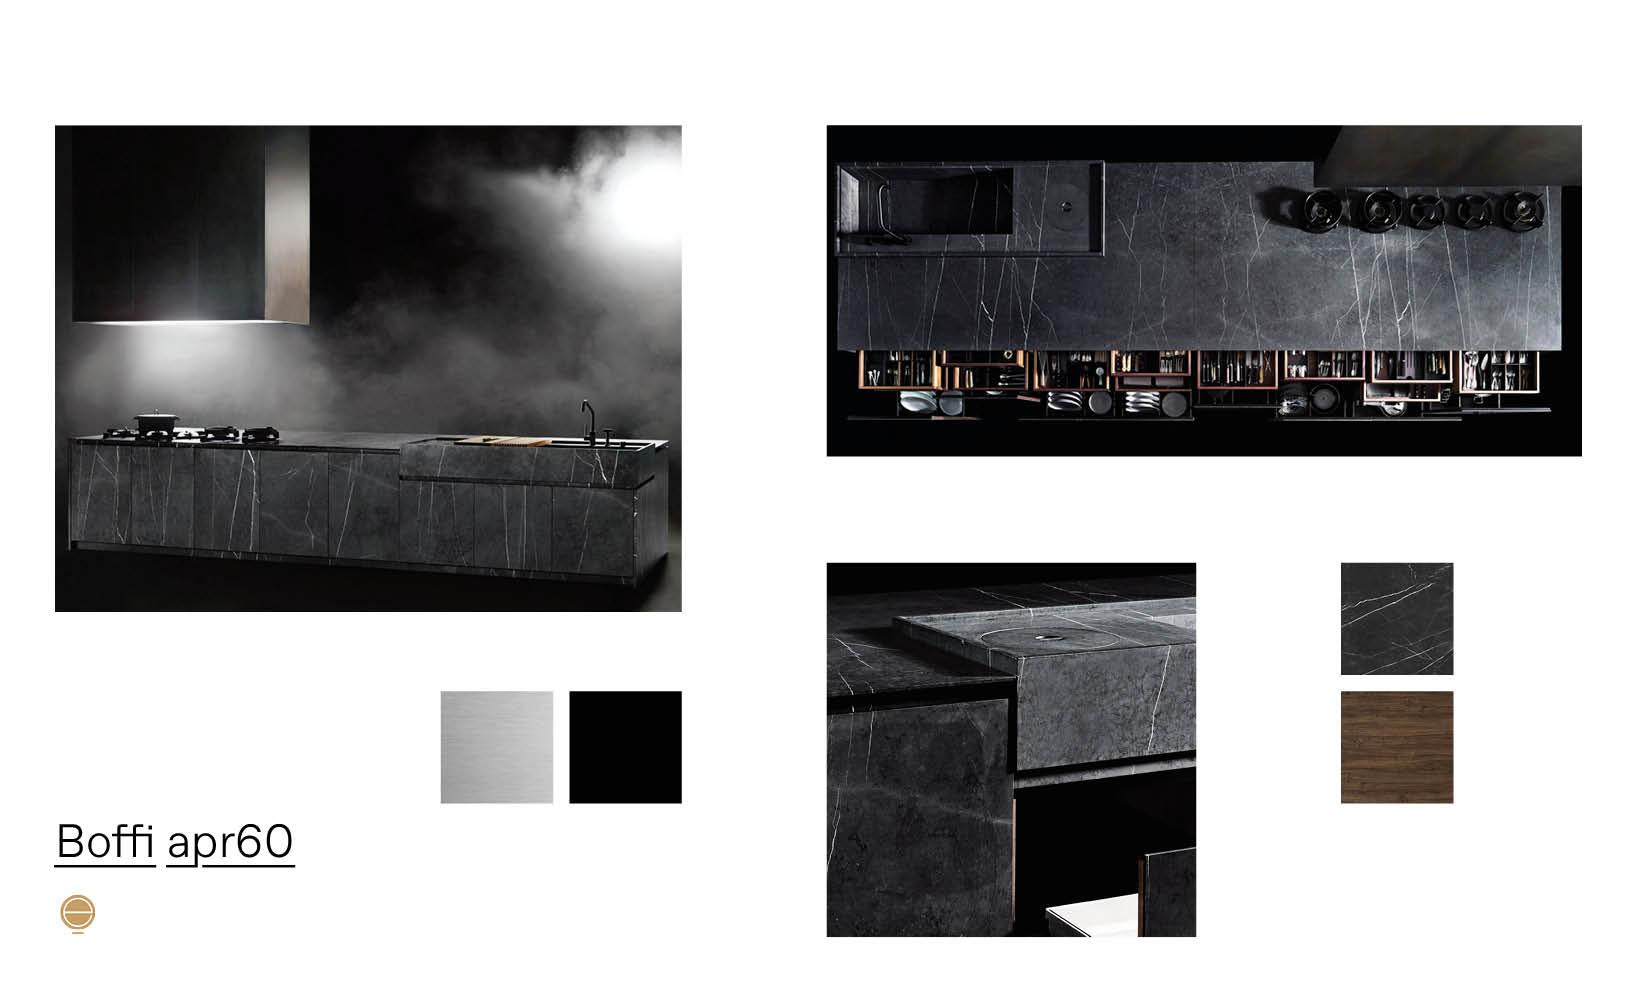 bespoke luxury kitchens and Boffi Apr60 product moodboard made by esperiri